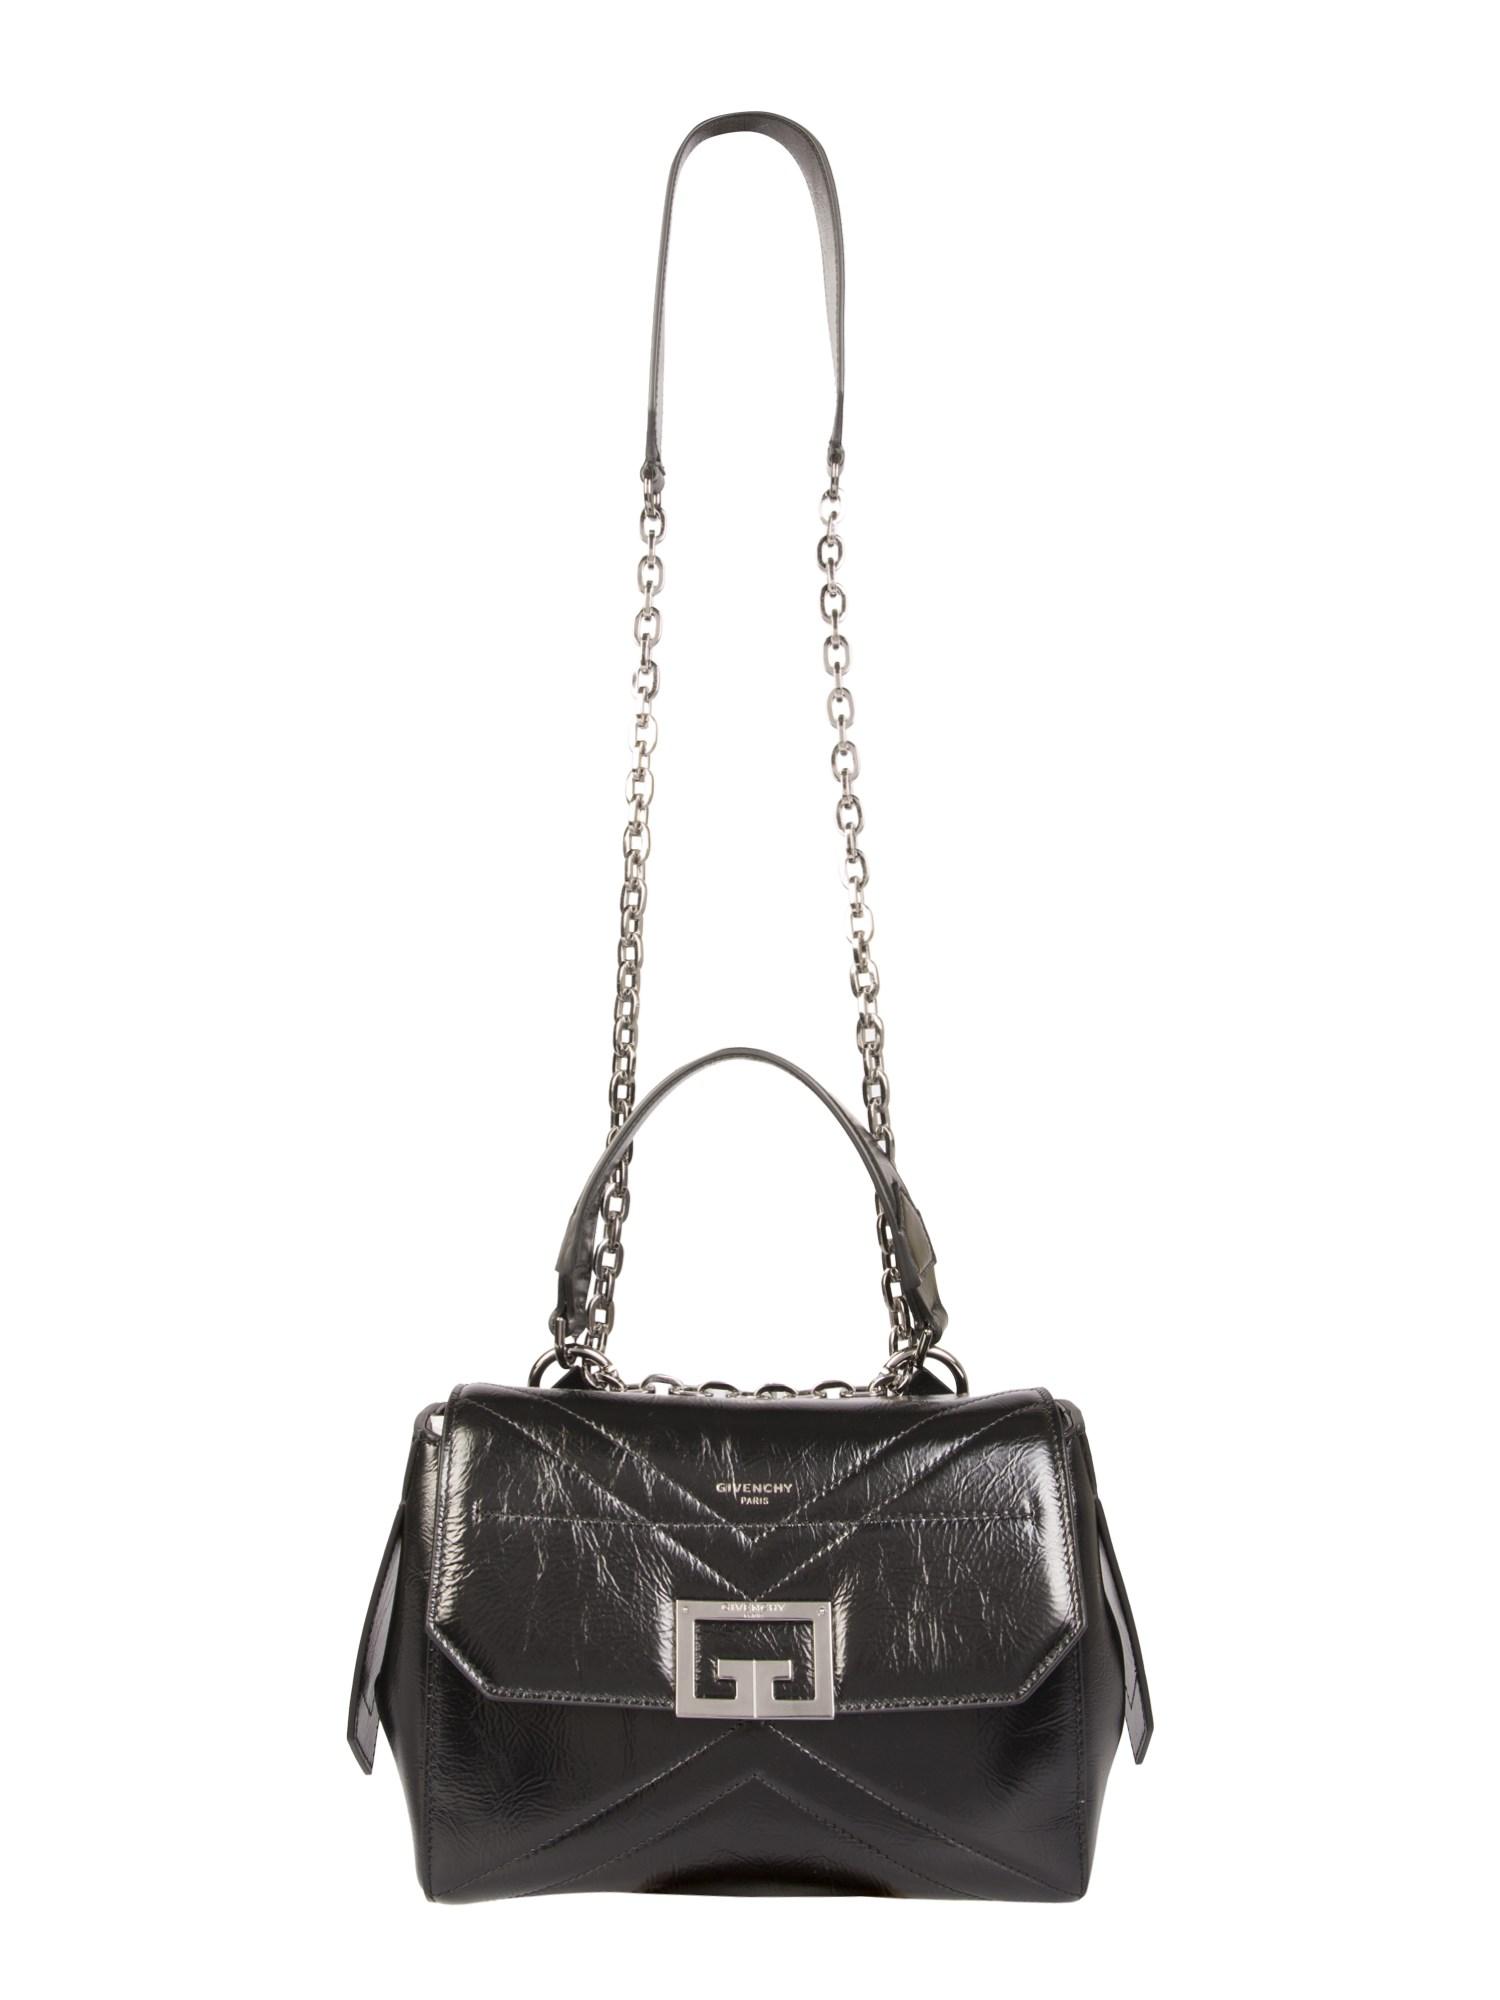 Givenchy SMALL ID BAG